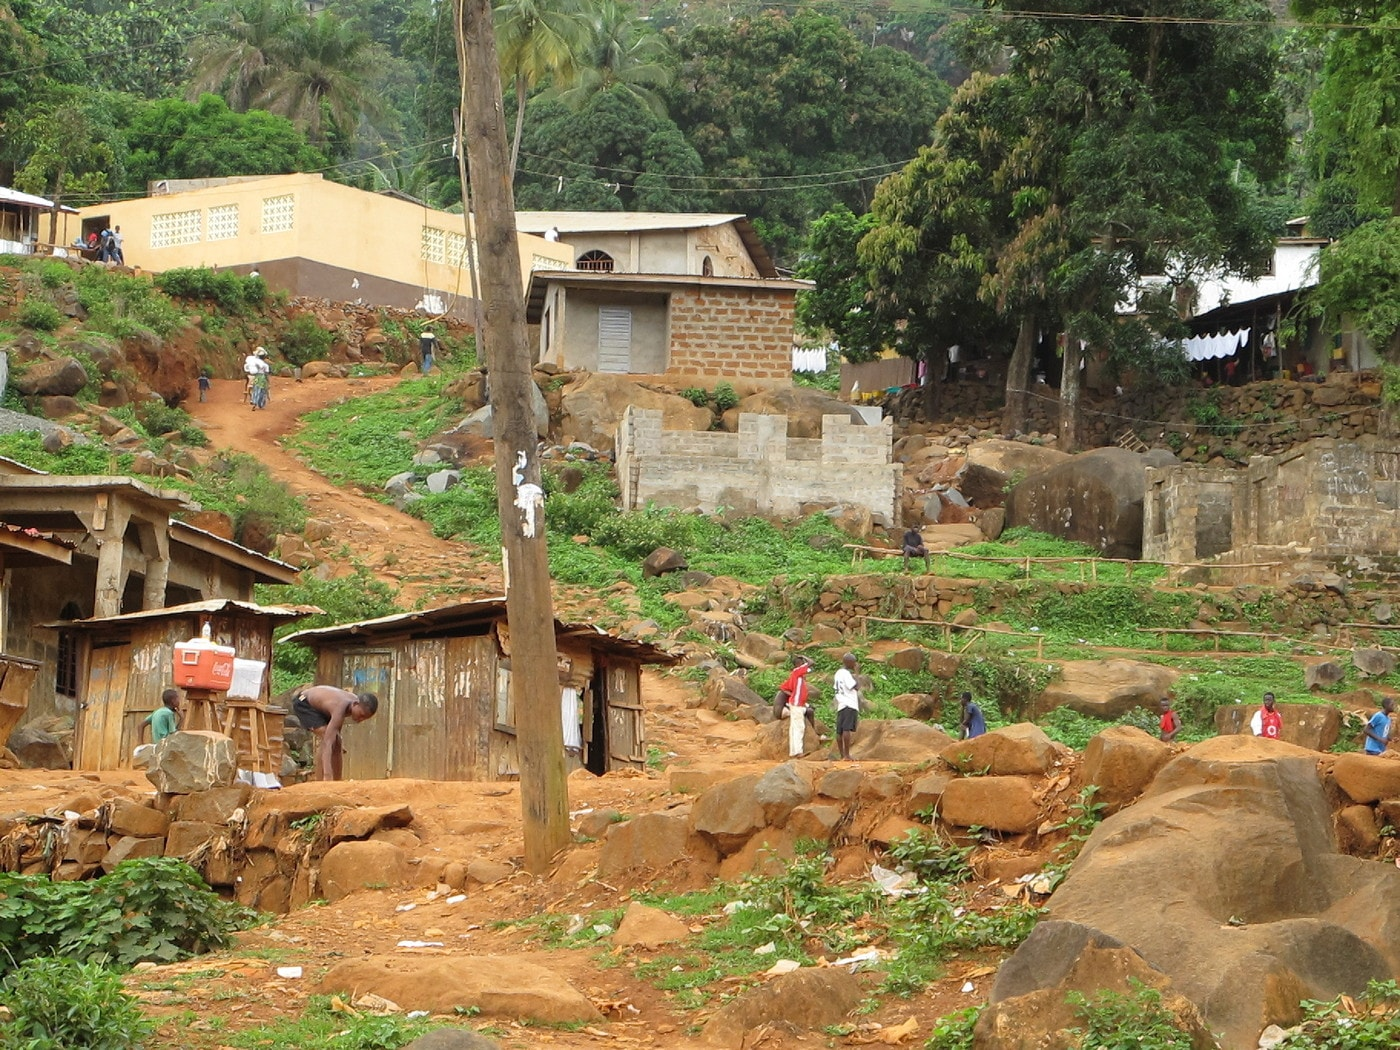 Голосование на блокчейне и отключение интернета. Как выбирали президента в Сьерра-Леоне